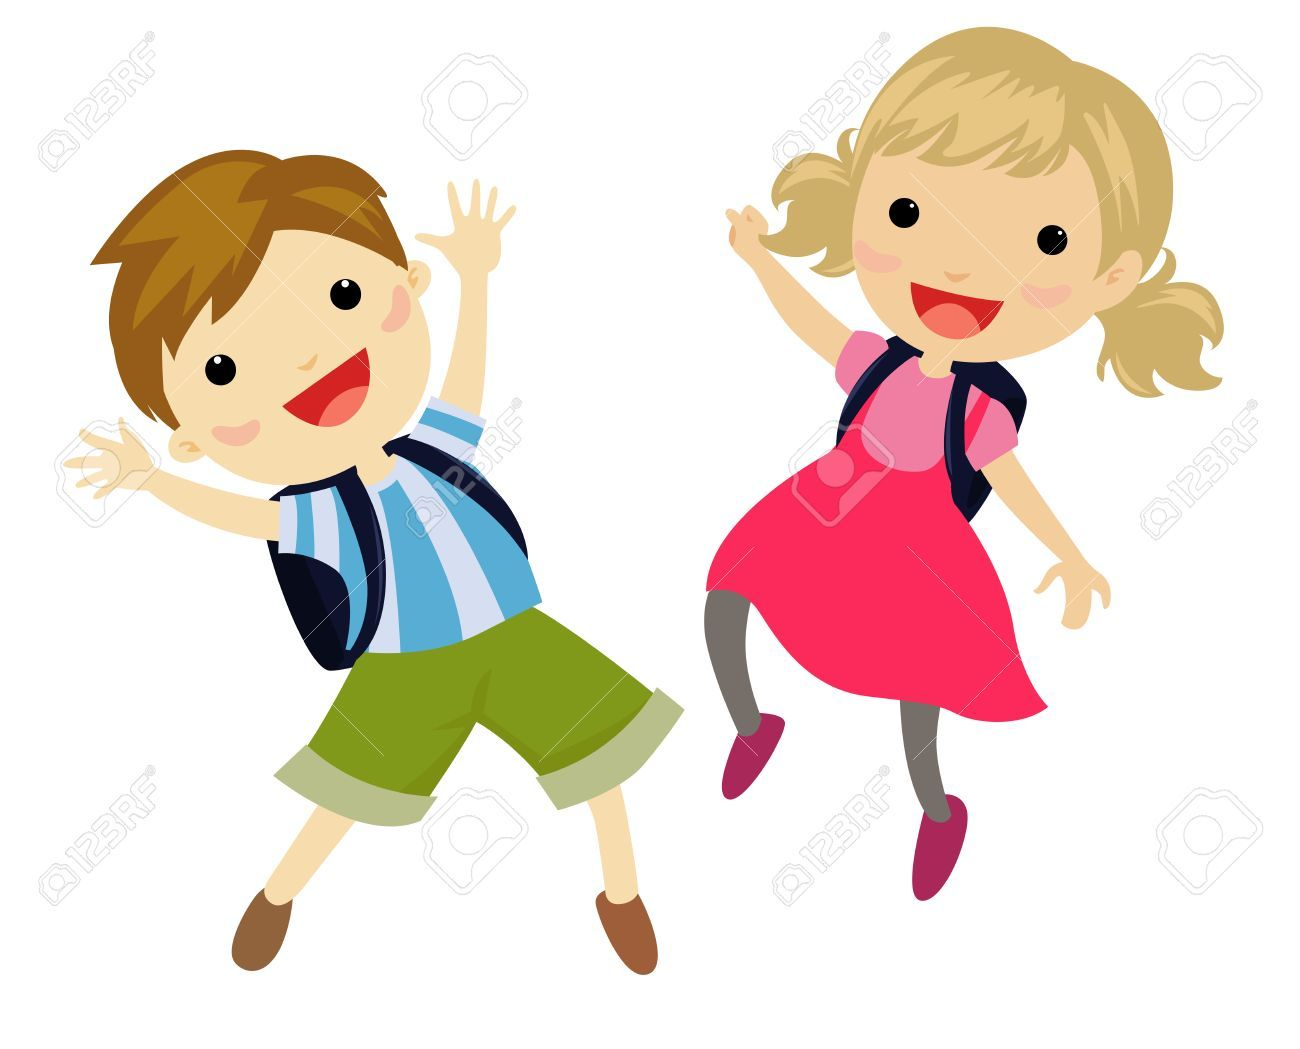 transparent stock Jumping clipart 1 kid. Kids portal